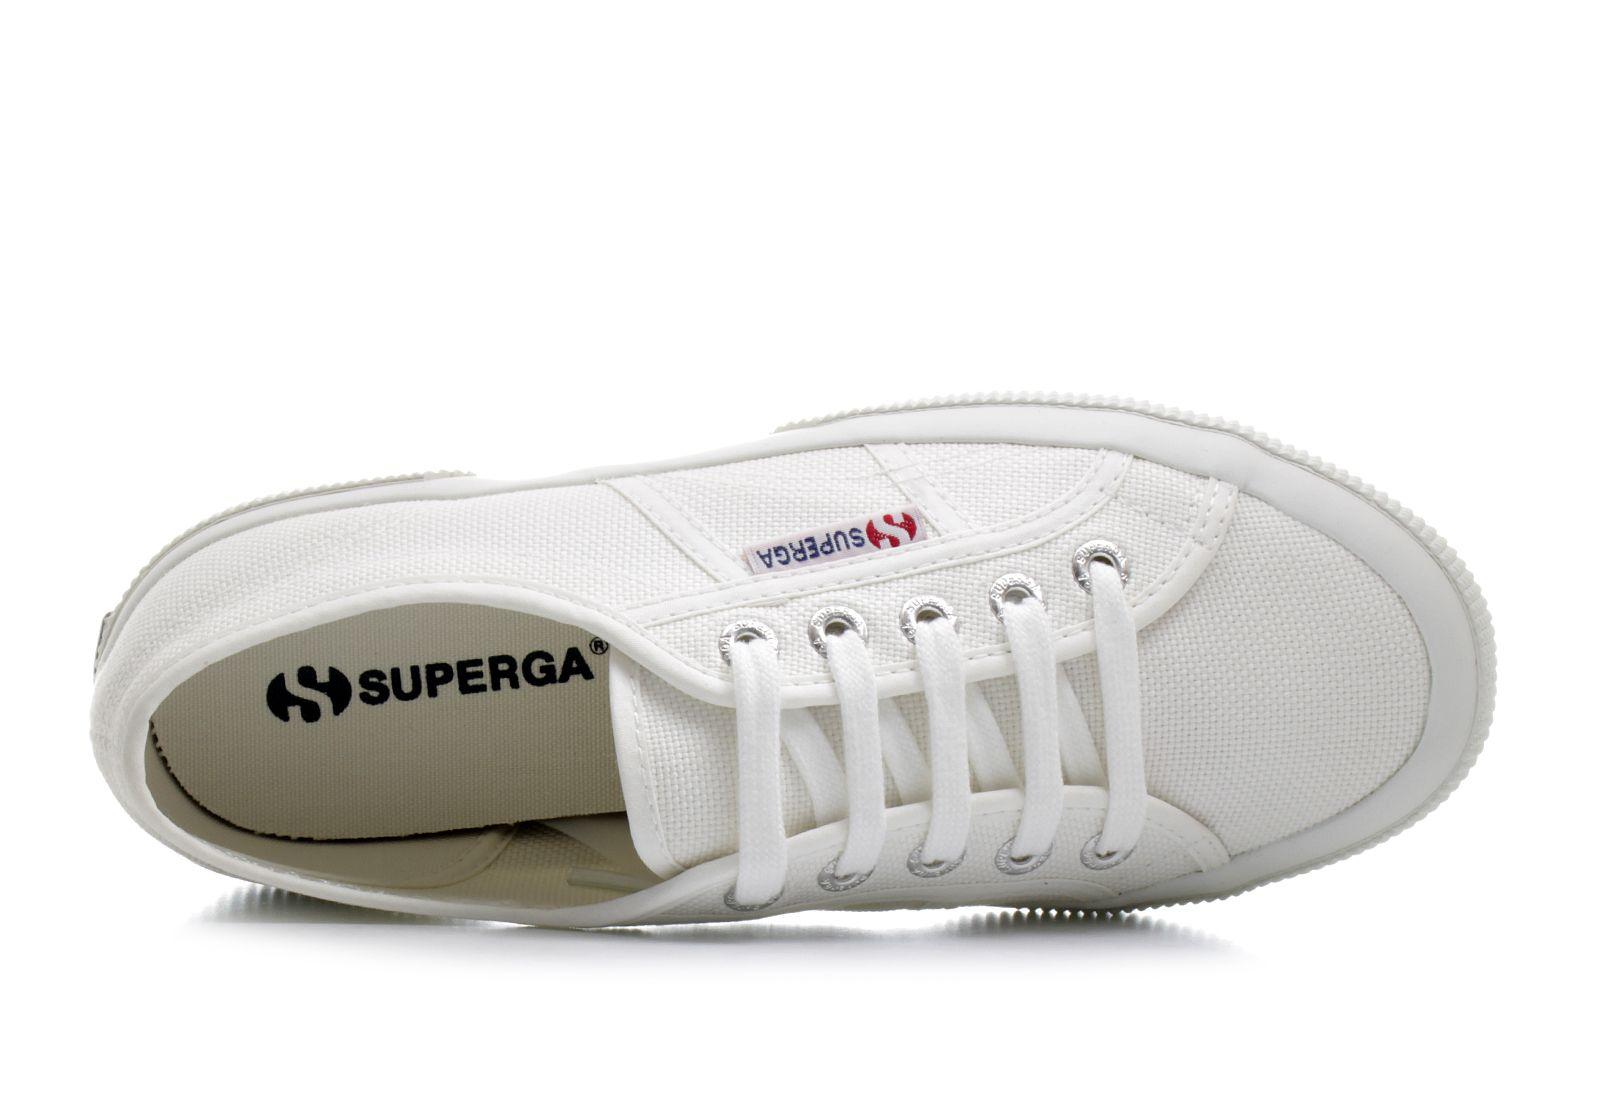 Superga Topánky - Cotu Classic - 2750-cotu-wht - Tenisky c553d55c6a